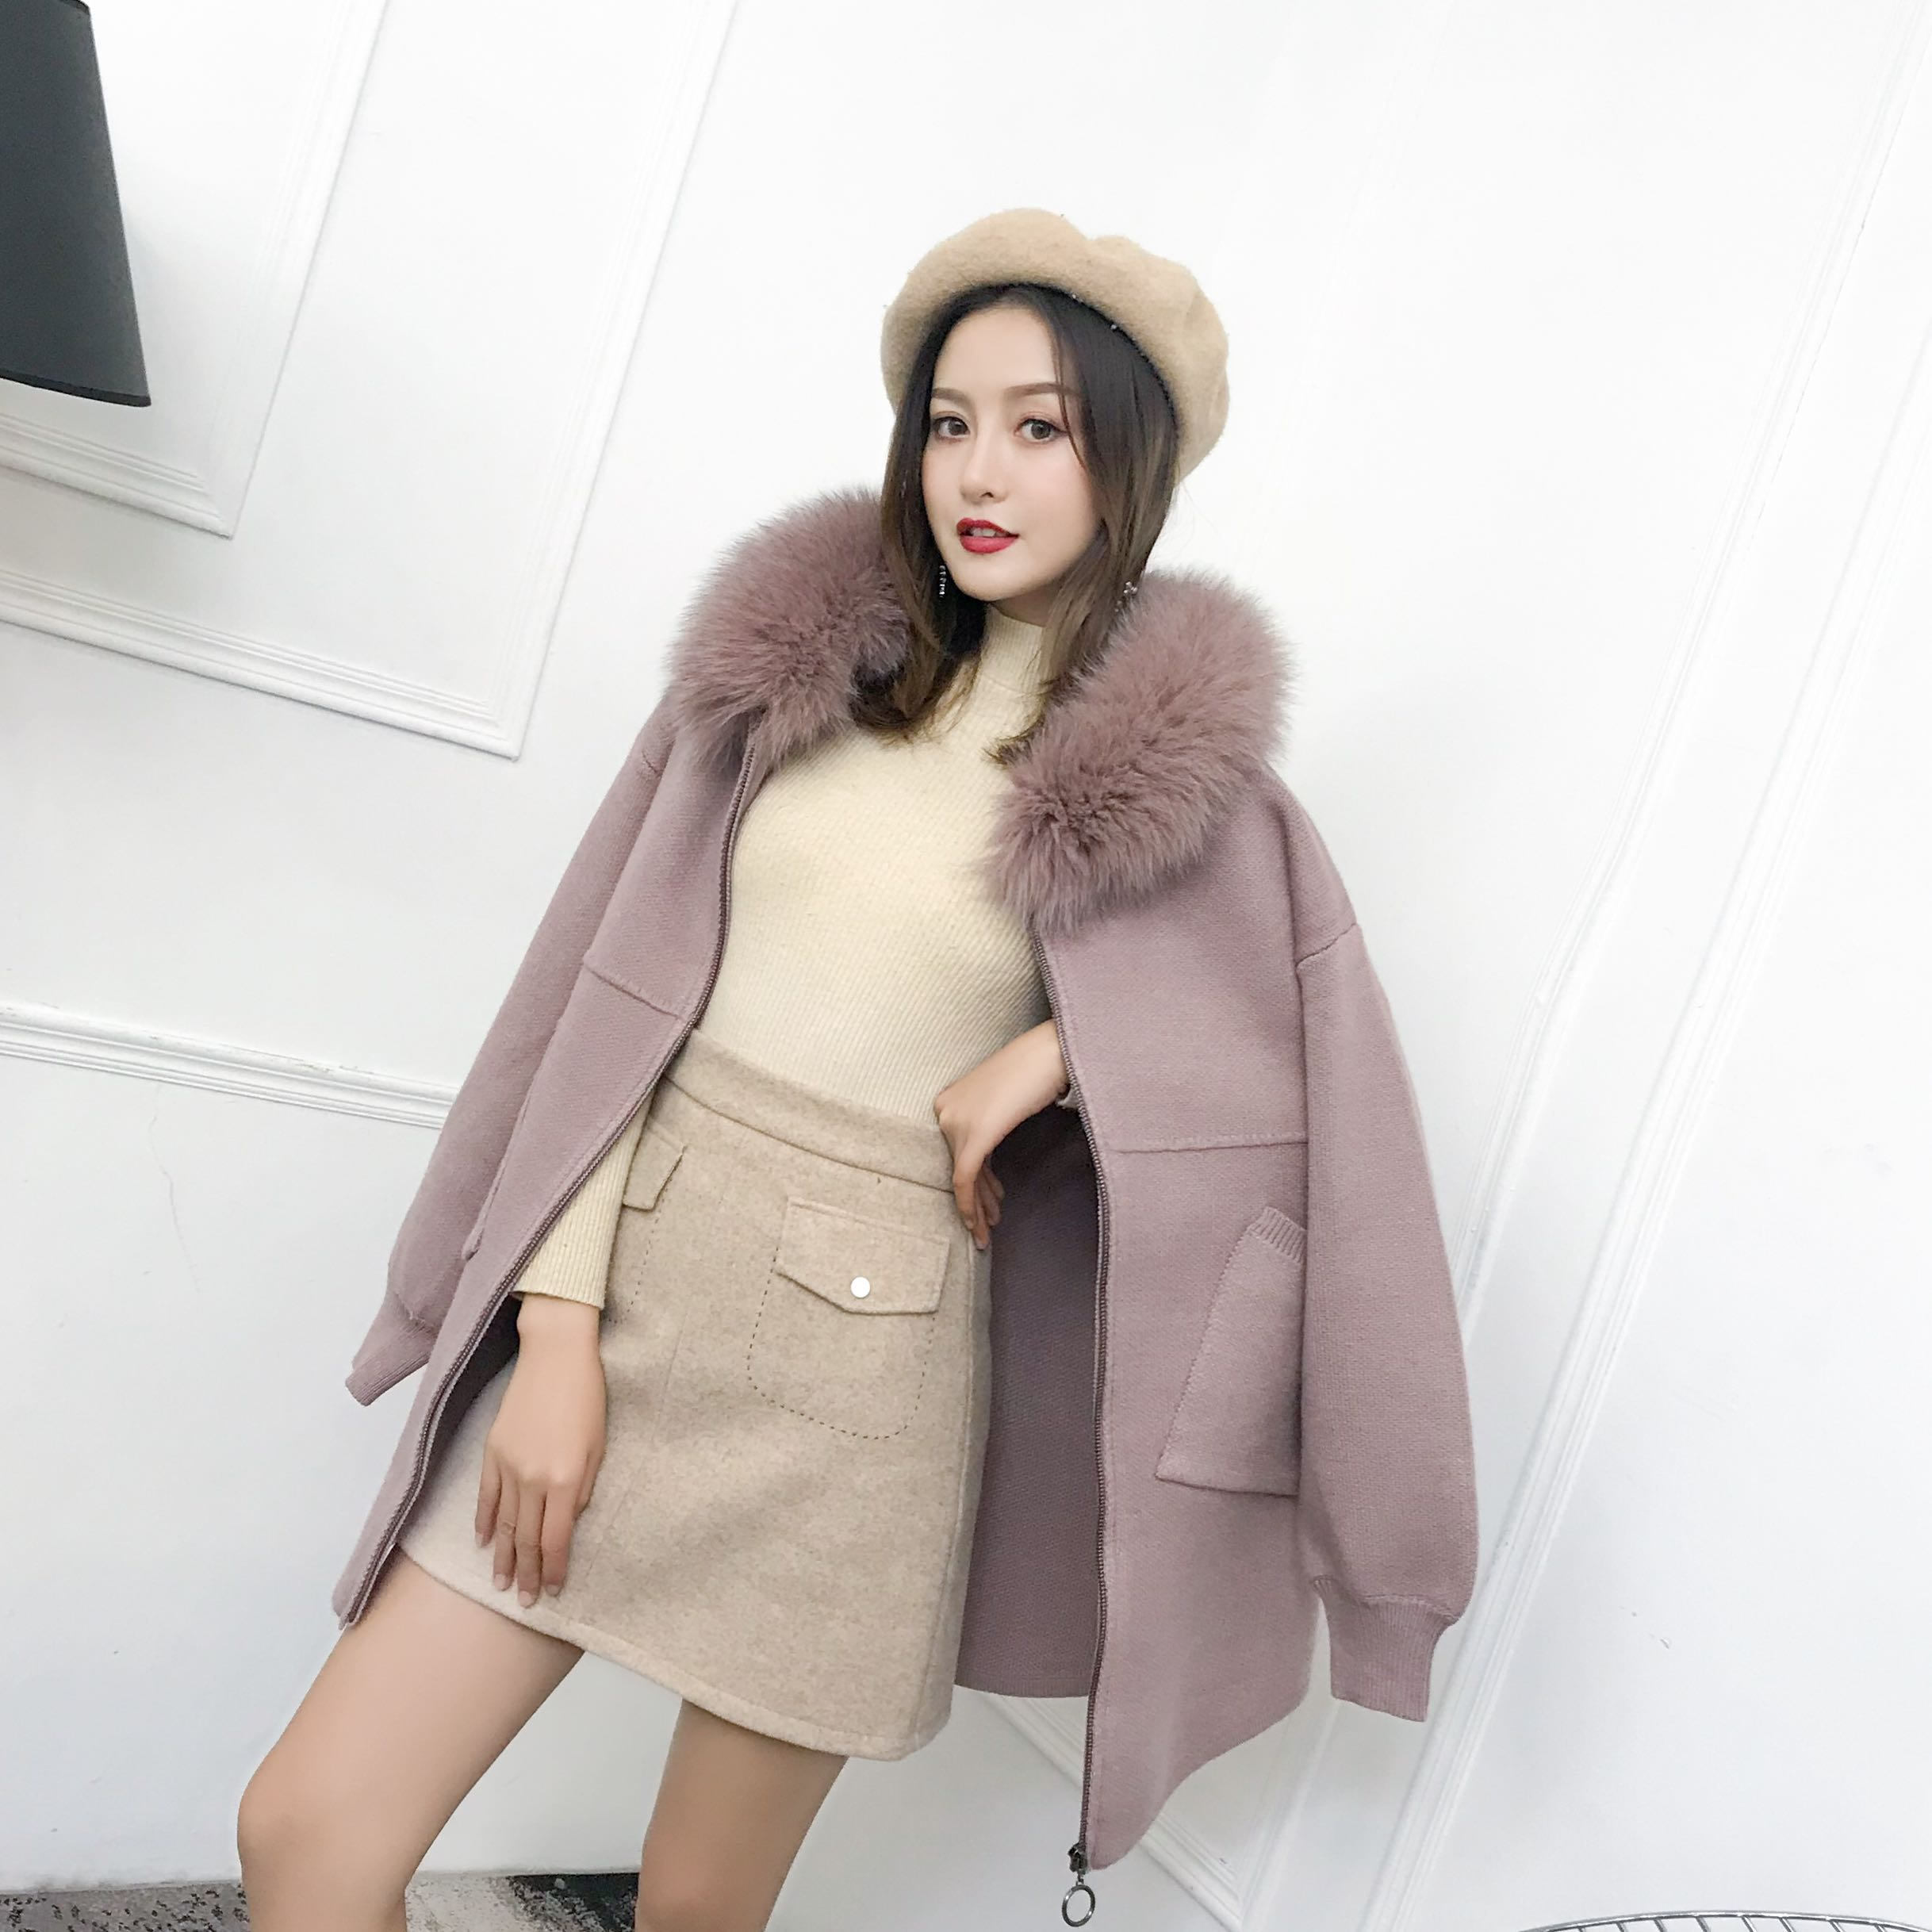 2020 winter women's sweater fashion temperament fox fur collar hooded zipper pocket thick sweater cross strap mid-length sweater enlarge